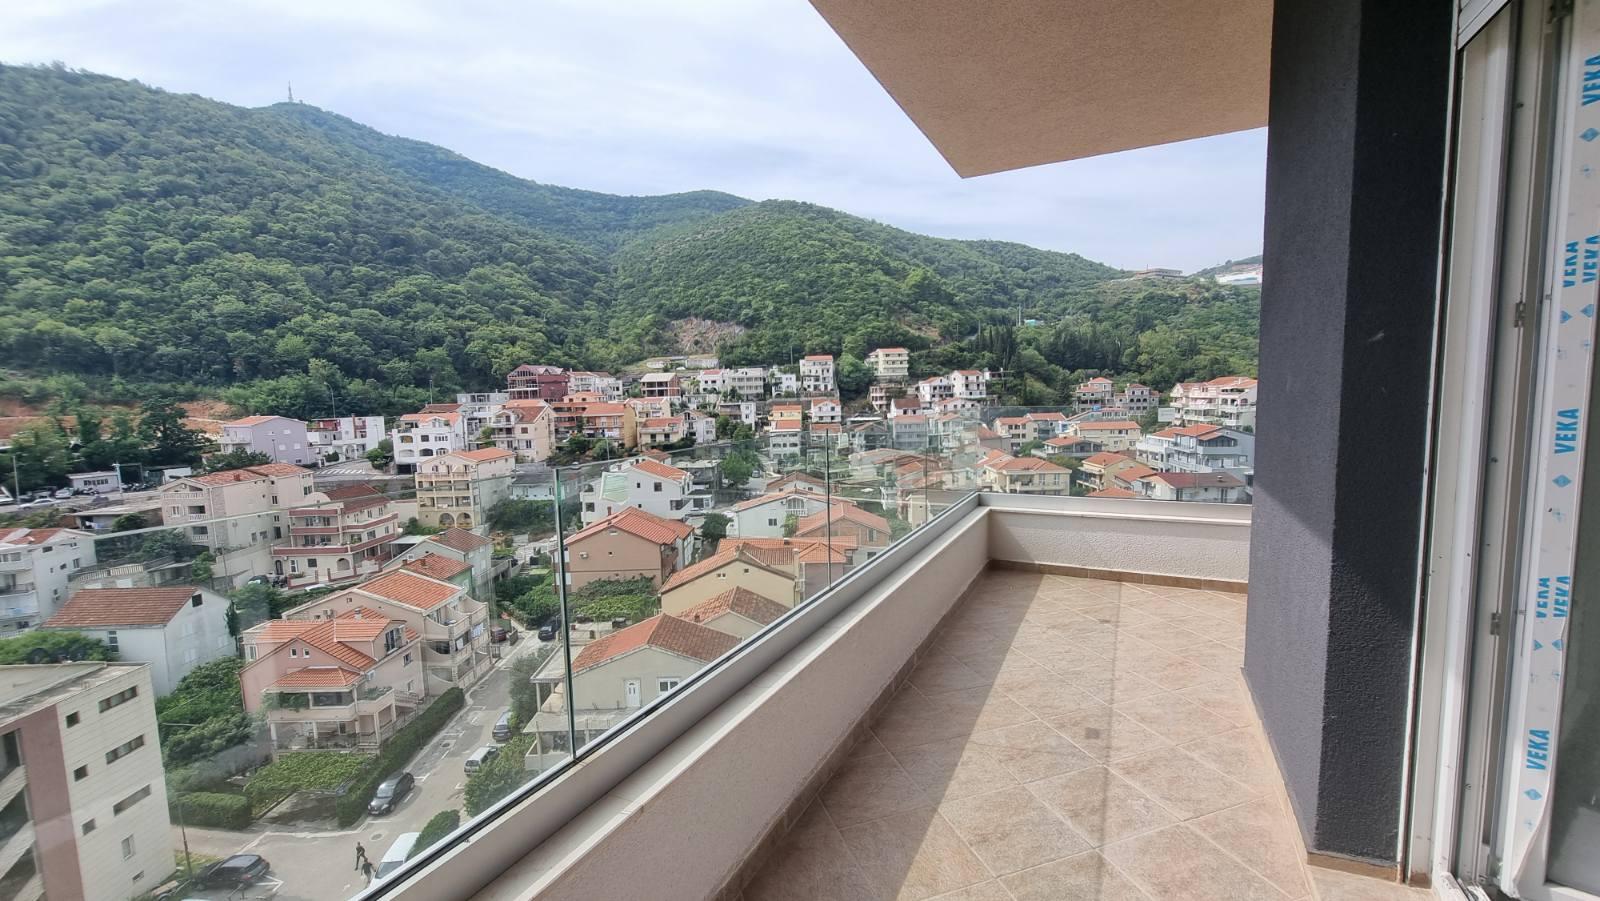 amforaproperty.com/Trosoban penthouse 105 m2 THE OLD BAKERY